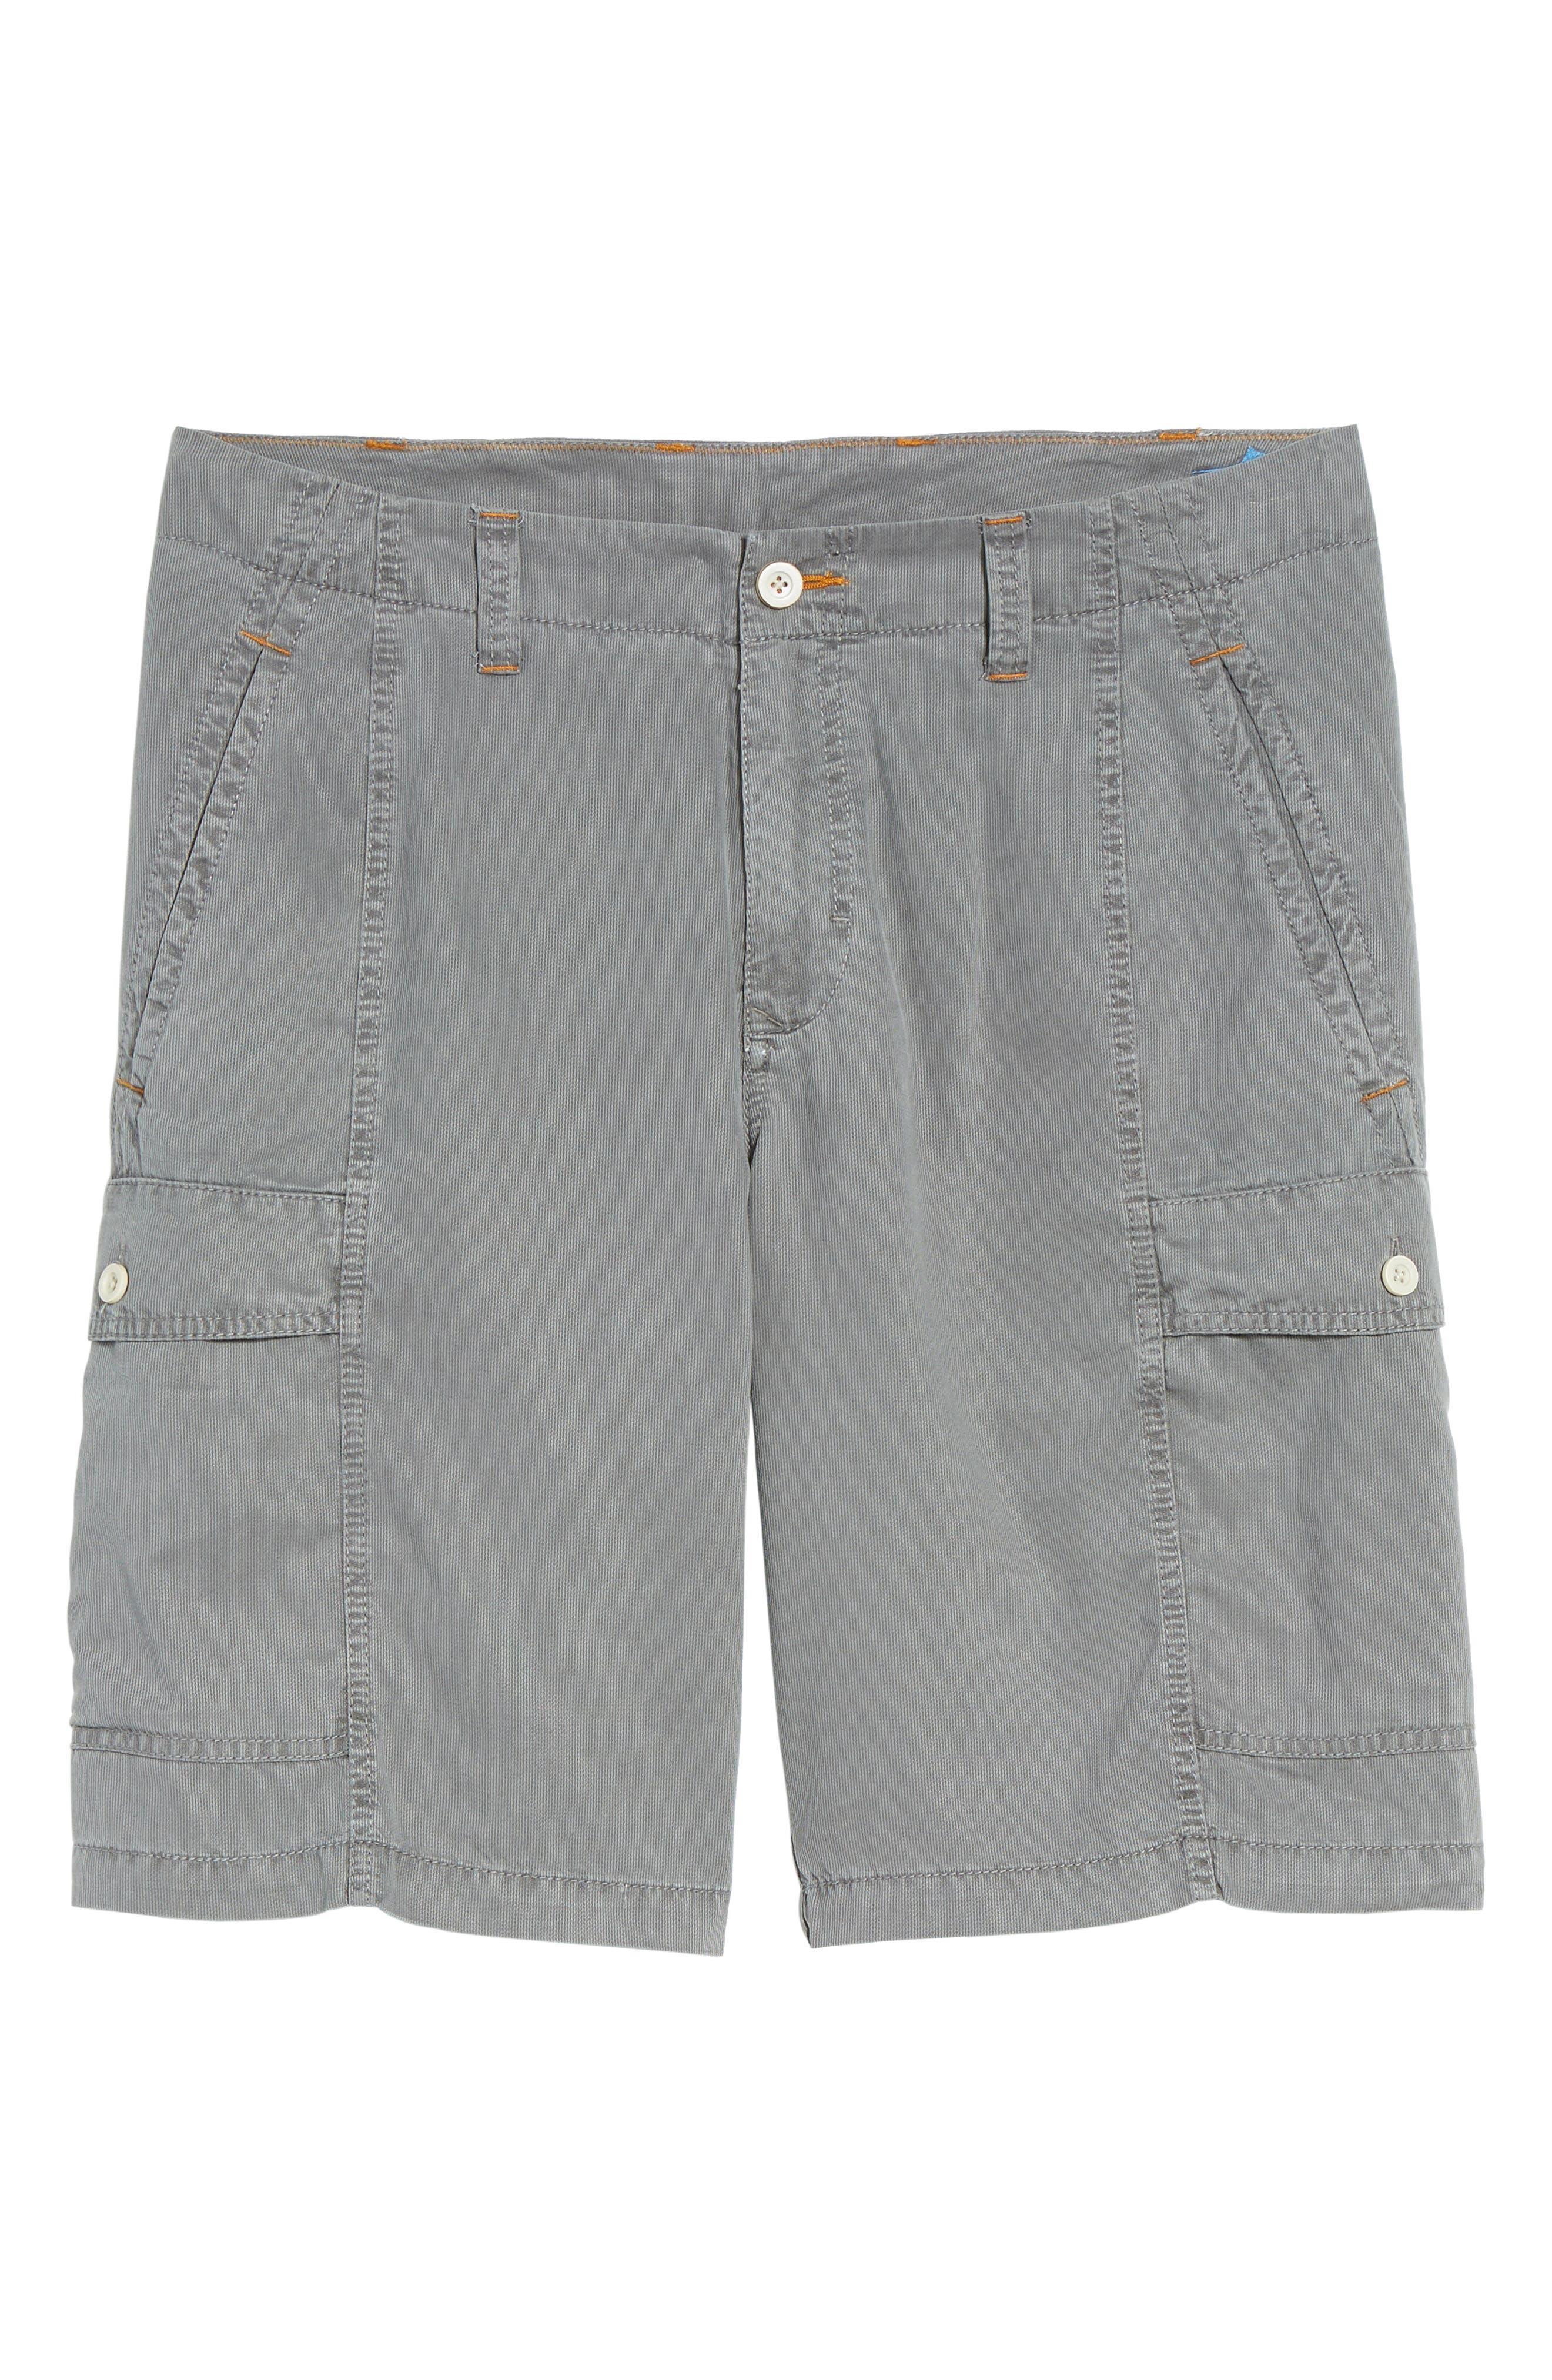 'Beachfront Kihei' Cargo Shorts,                         Main,                         color, 050